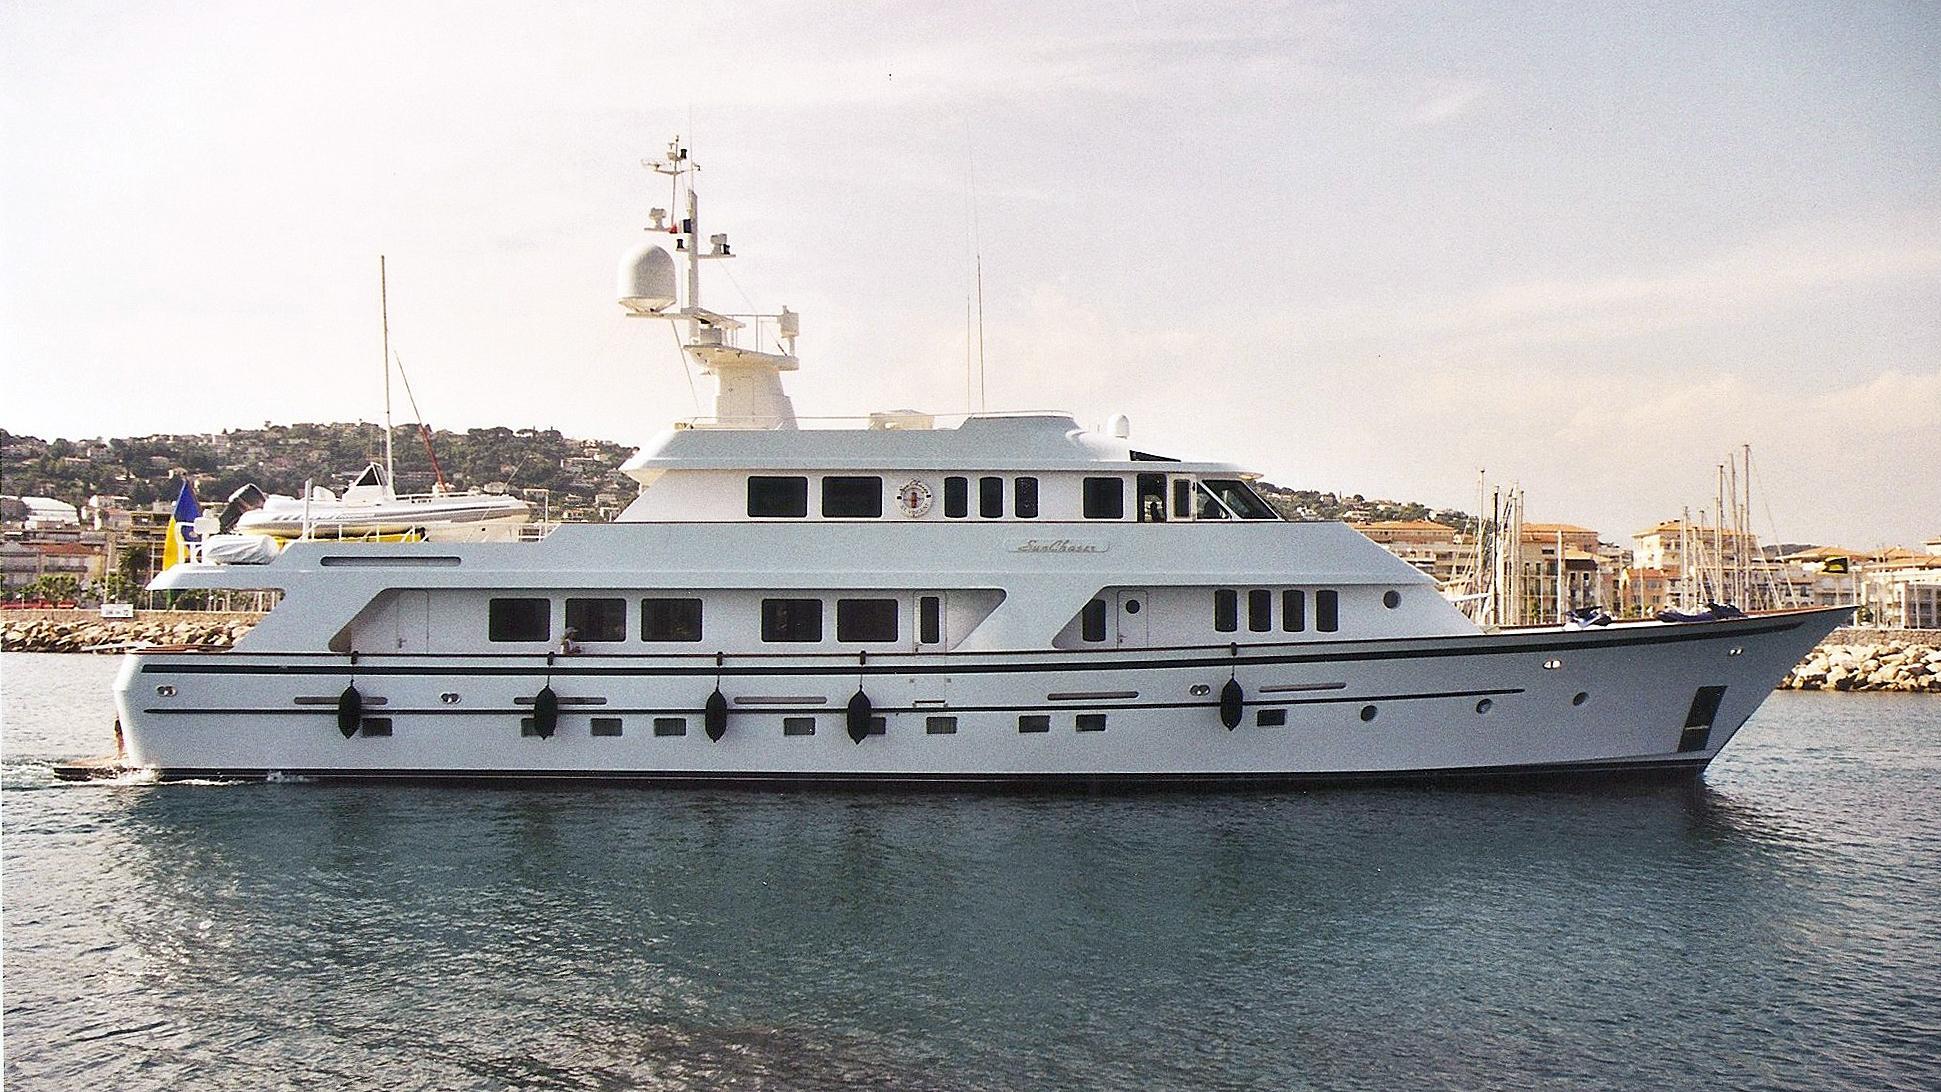 sun-chaser-motor-yacht-christensen-1991-38m-profile